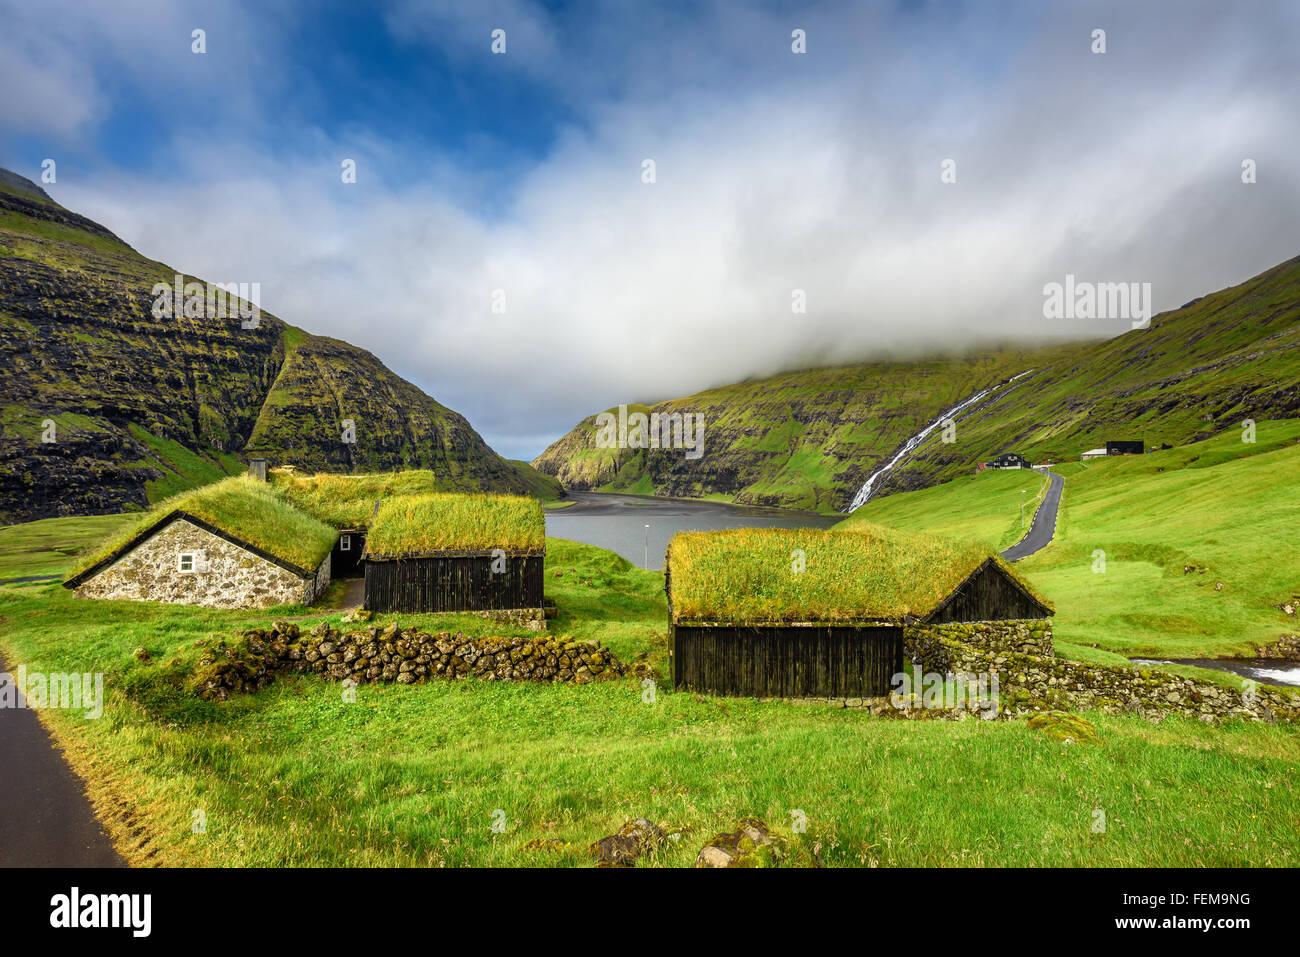 Village of Saksun located on the island of Streymoy, Faroe Islands, Denmark - Stock Image